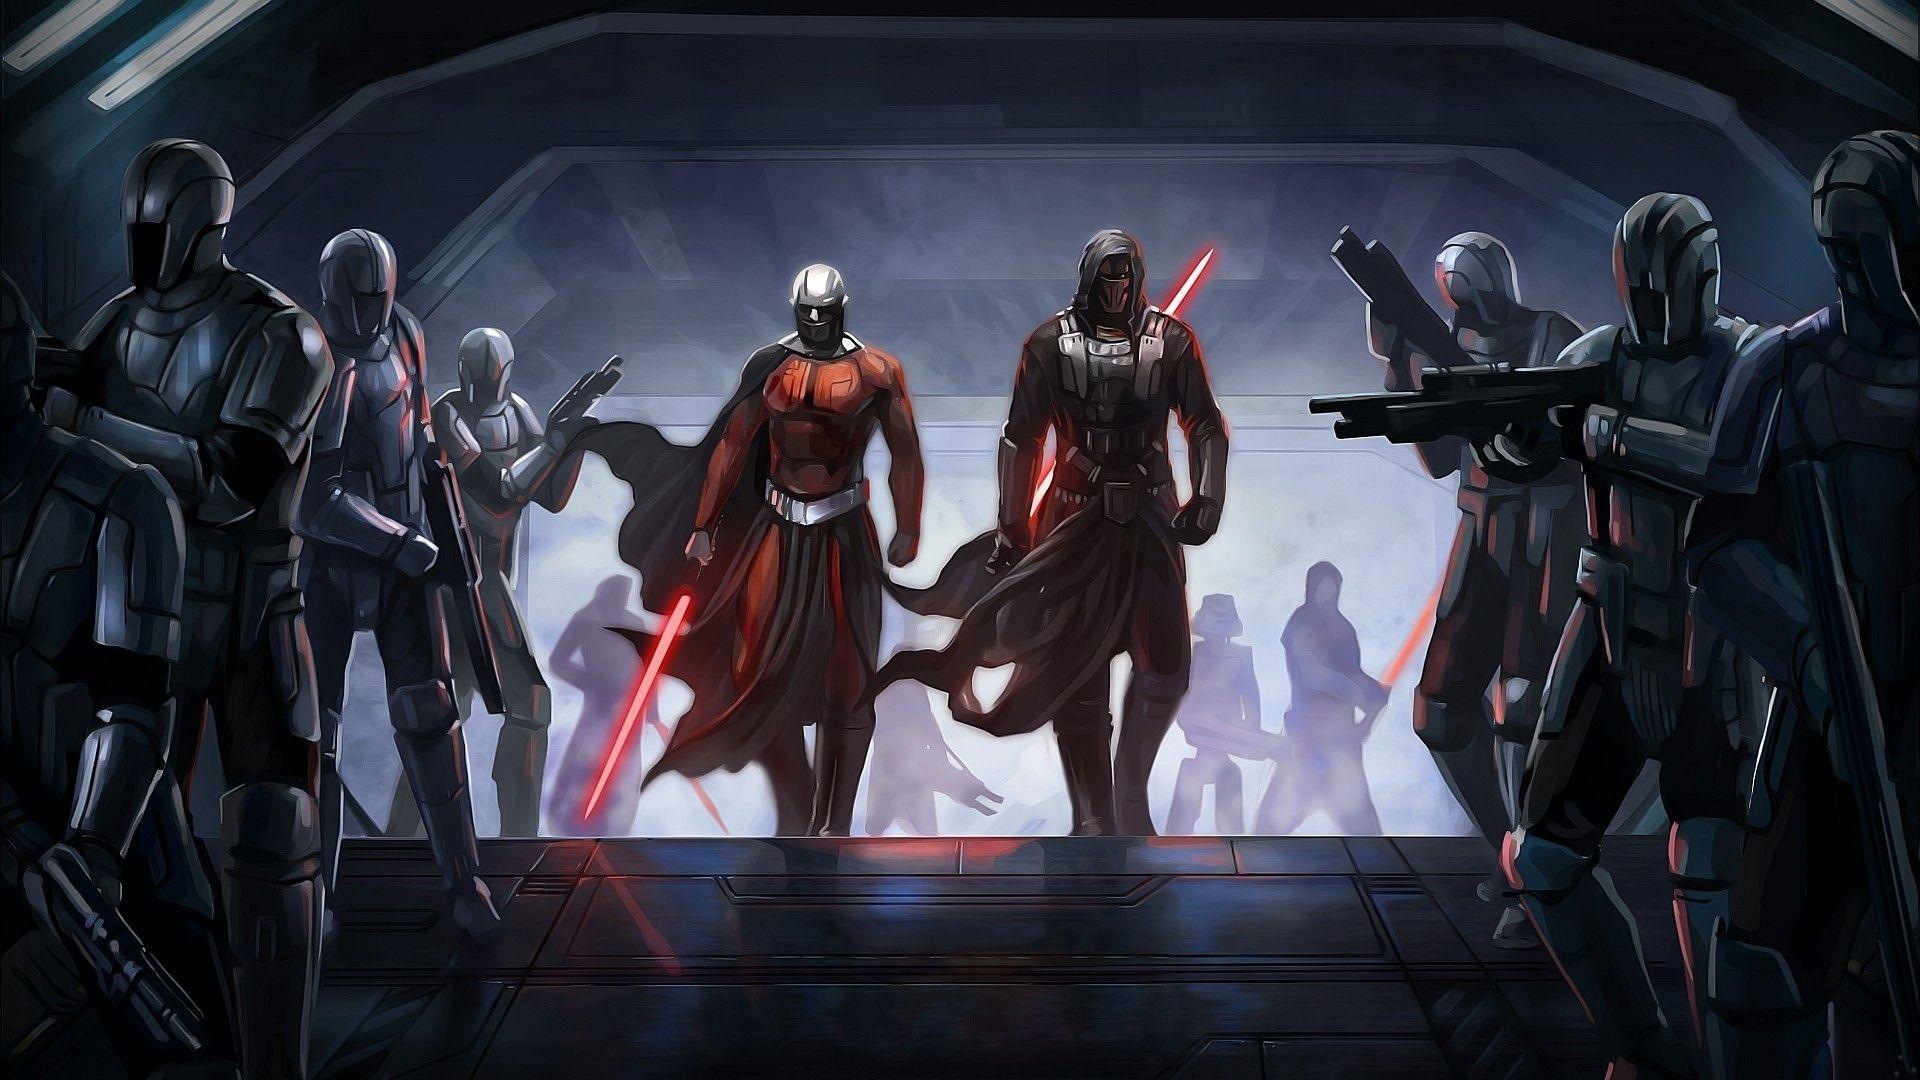 epic star wars backgrounds - wallpaper.wiki